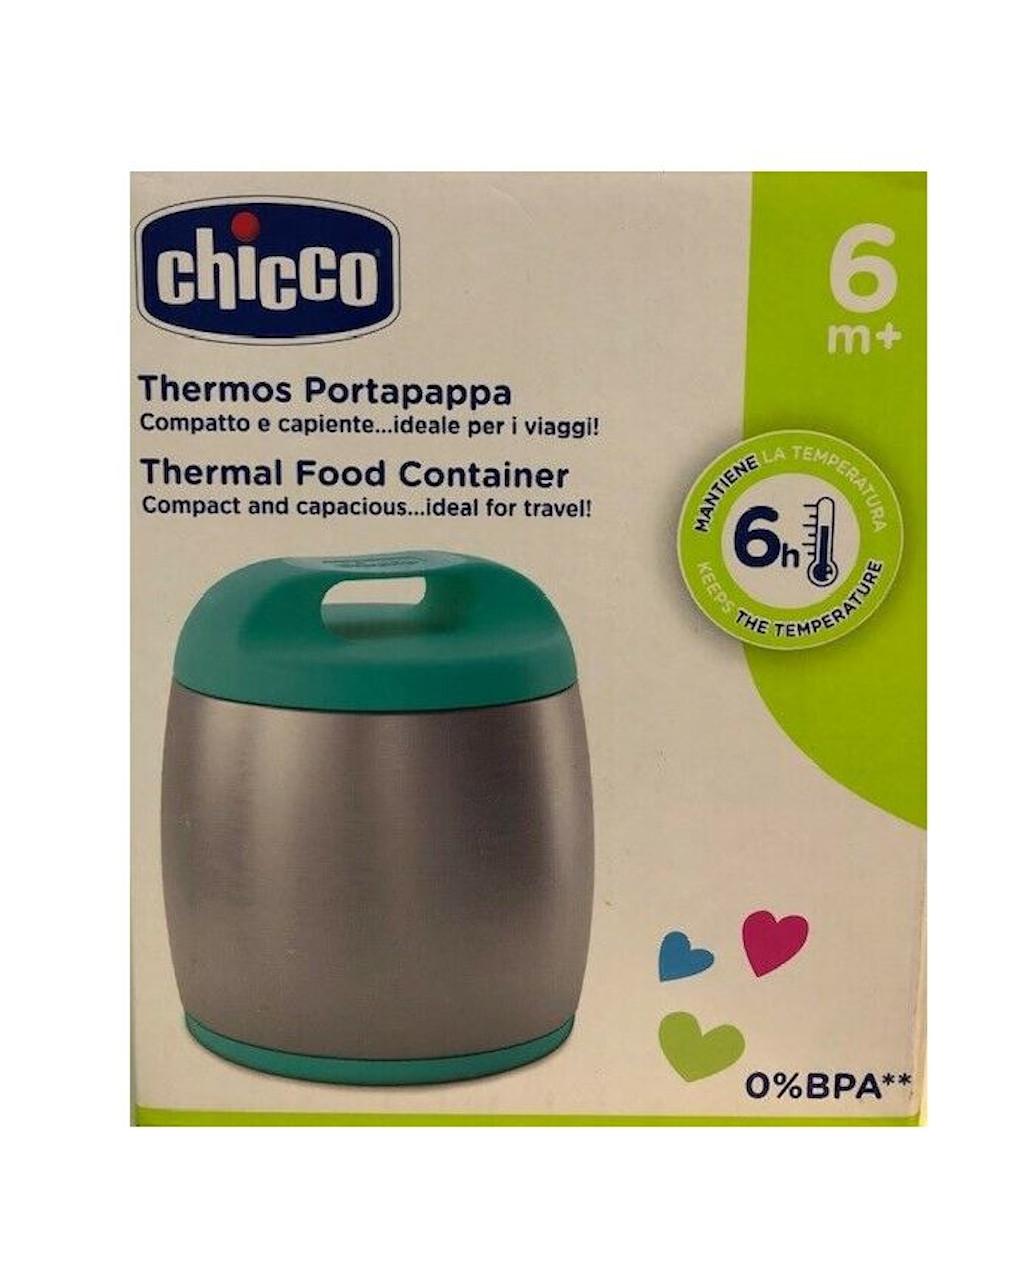 Thermos portapappa bimbo inox chicco - Chicco